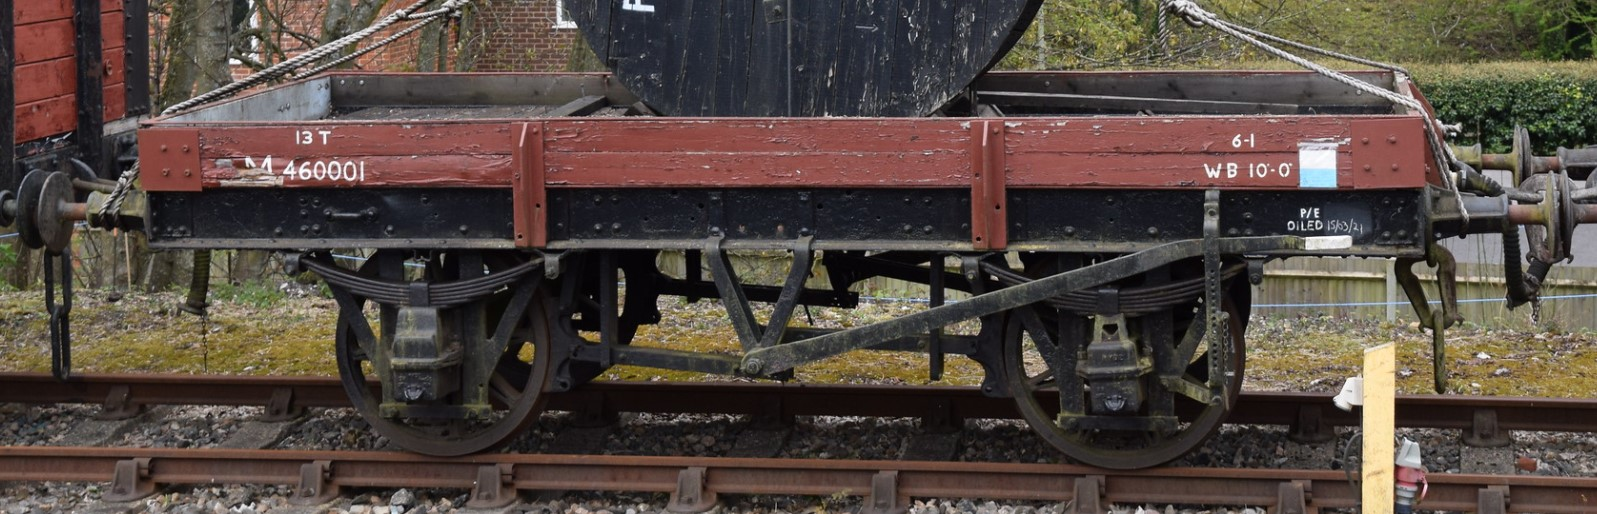 M460001 at the Mid Hants Railway in April 2021. ©Hugh Llewelyn